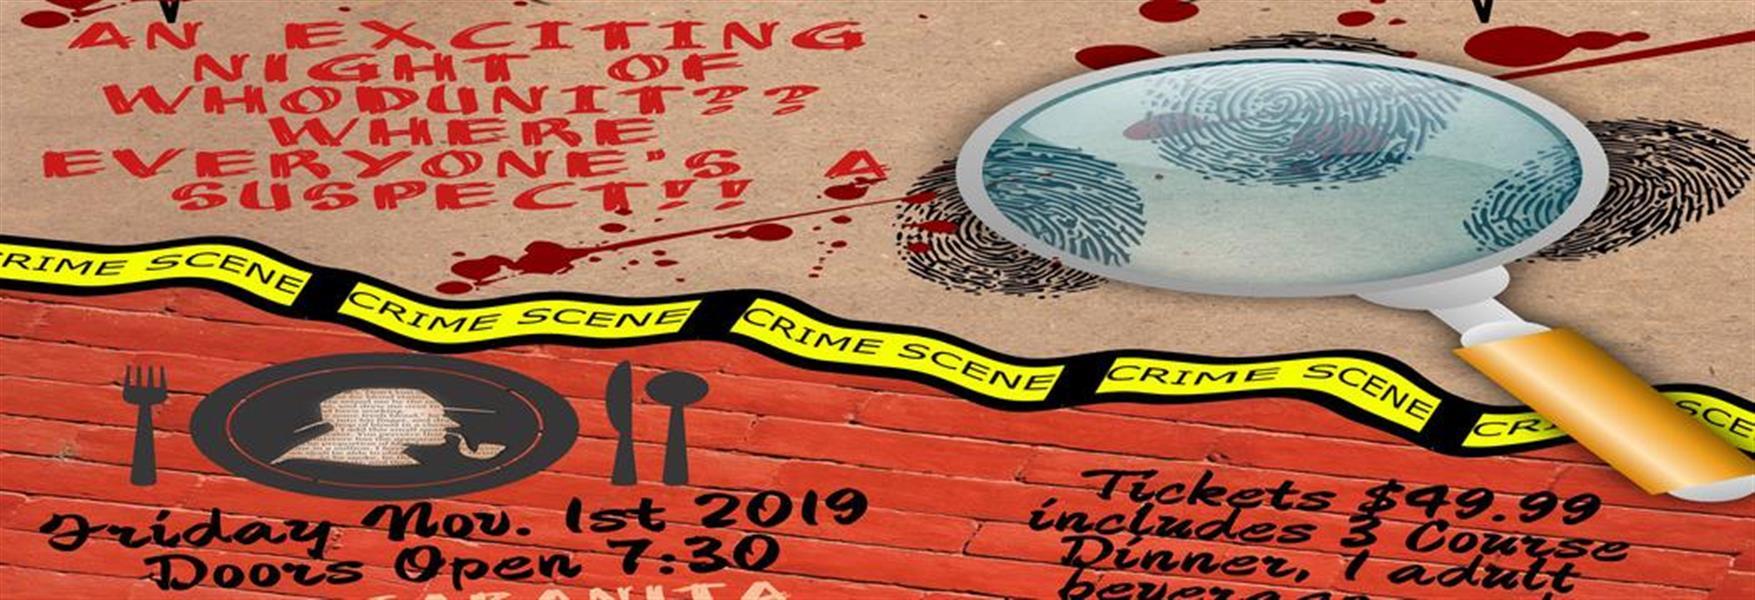 963201a4-046c-4321-a2ca-cc08f6c46f8b_Copy of murder mystery dinner theater flyer template-1.jpg